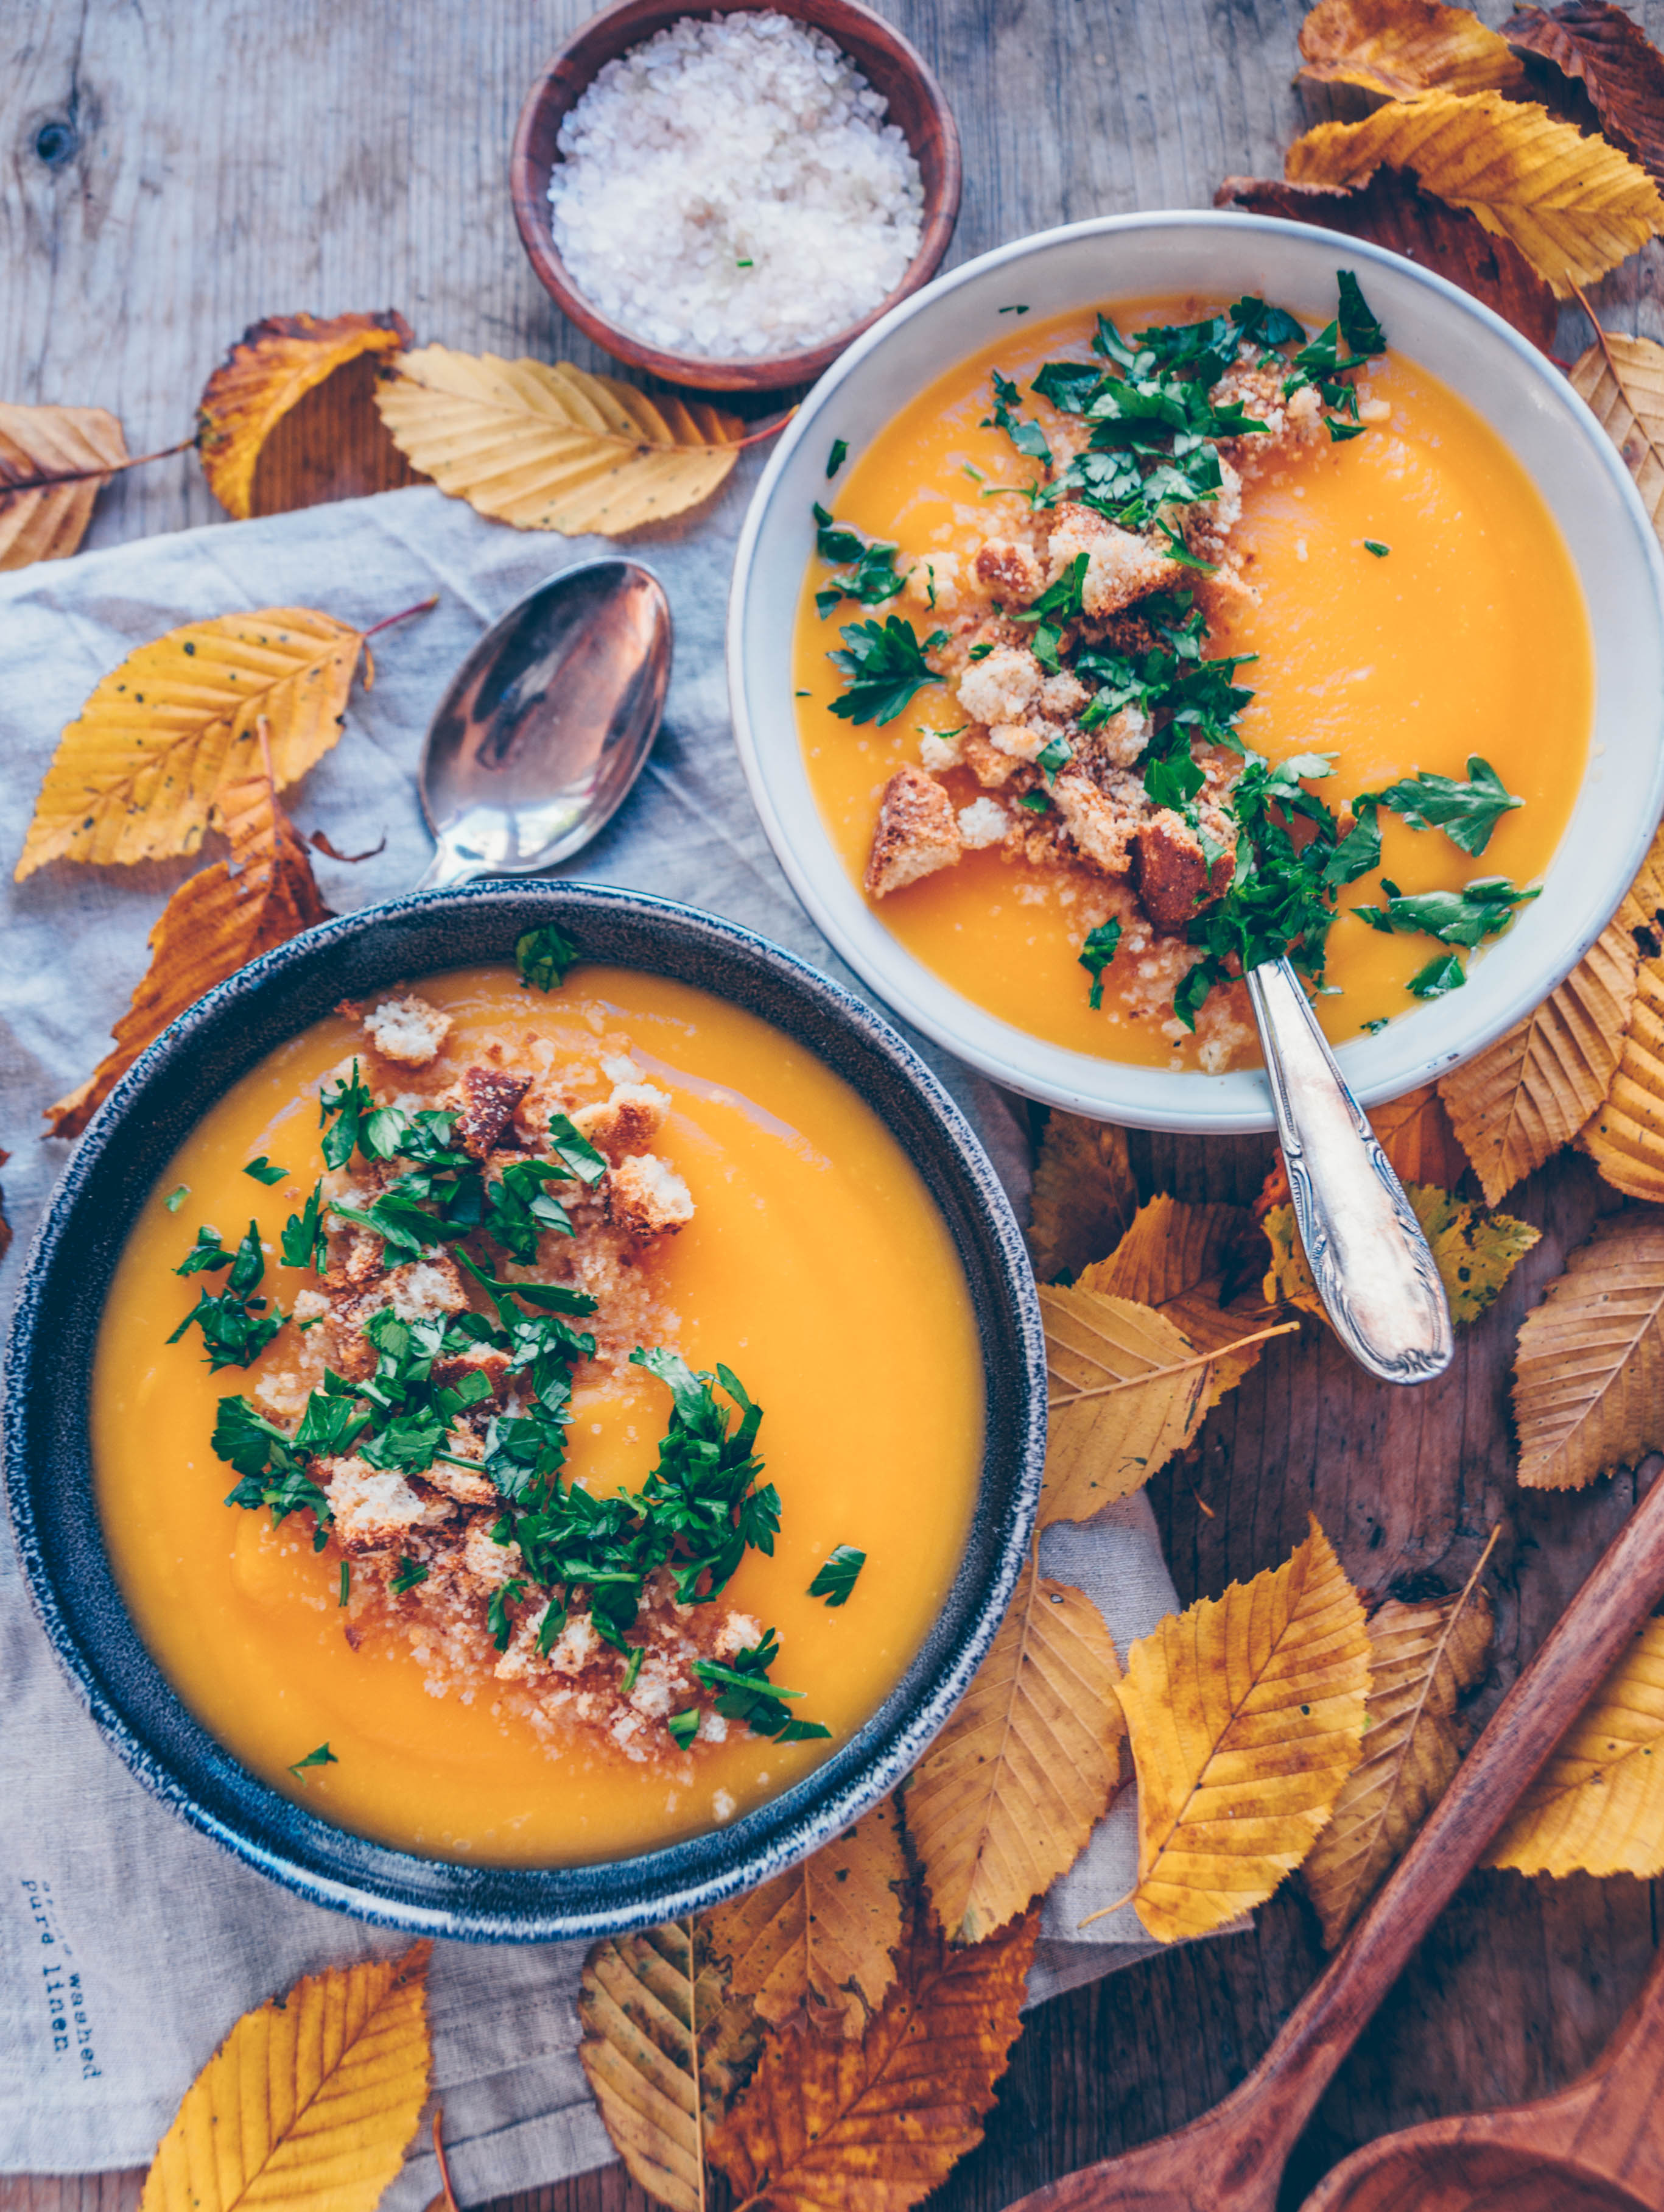 It is more than a pumpkin soup